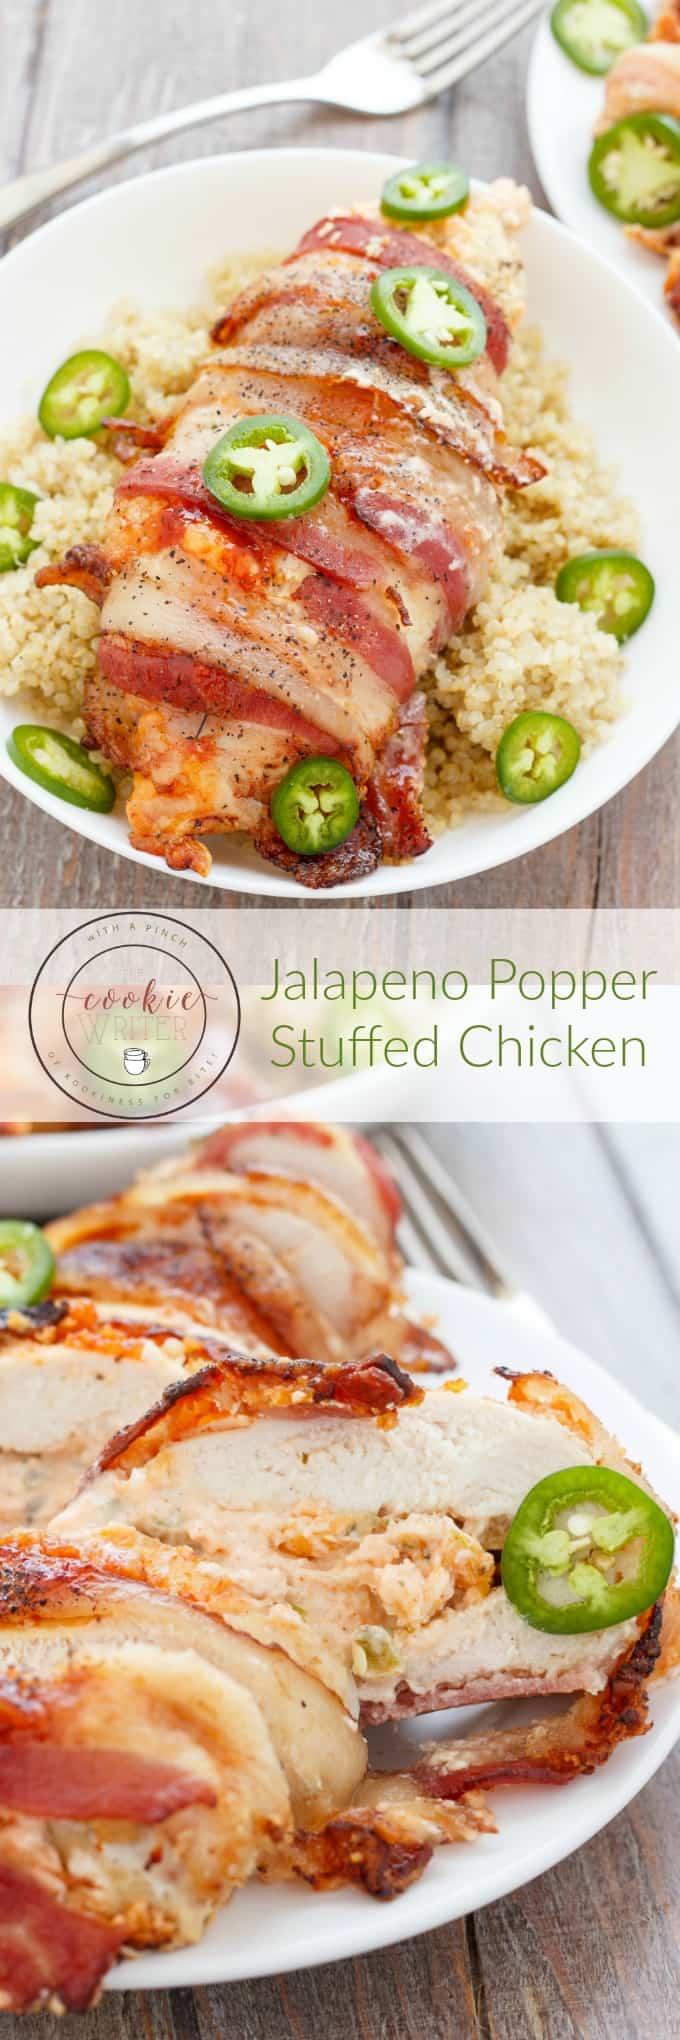 Jalapeno Popper Stuffed Chicken